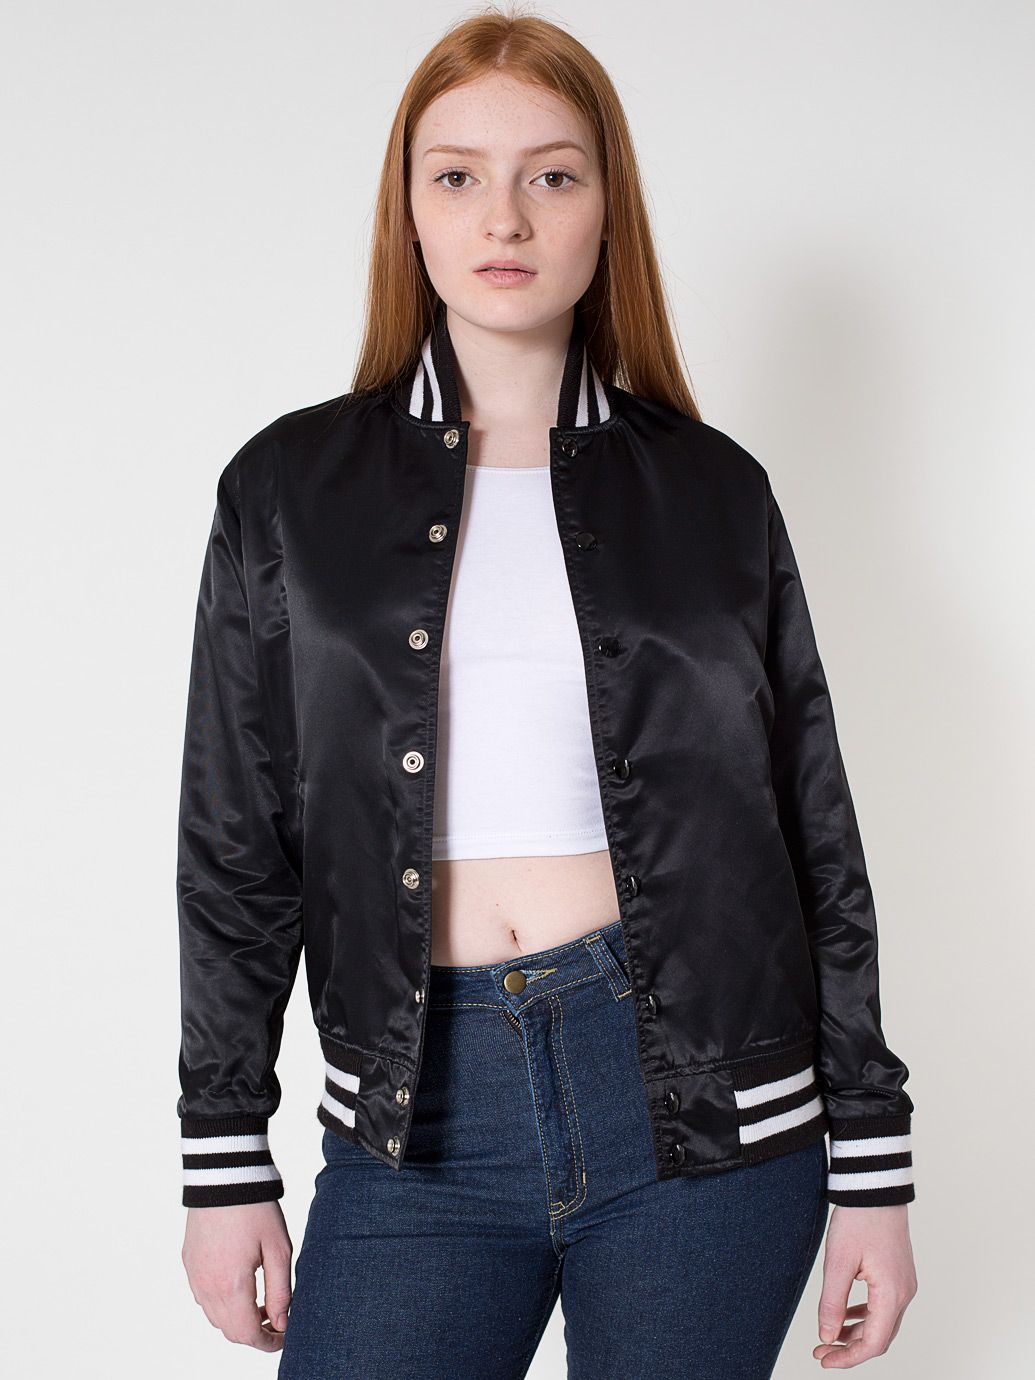 american apparel black satin jacket